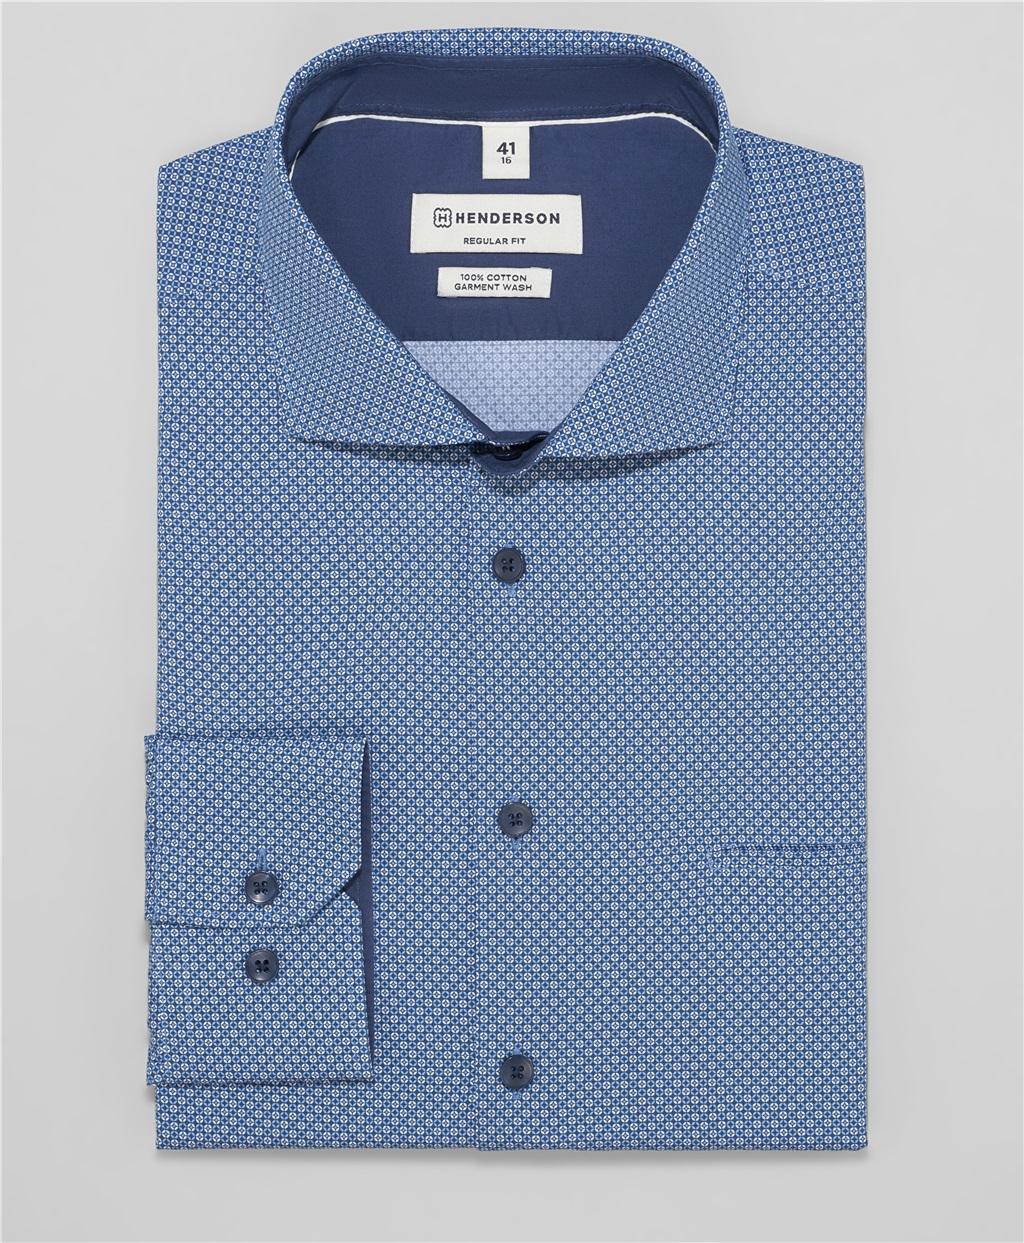 Рубашка прямой силуэт HENDERSON SHL-1478 NAVY фото